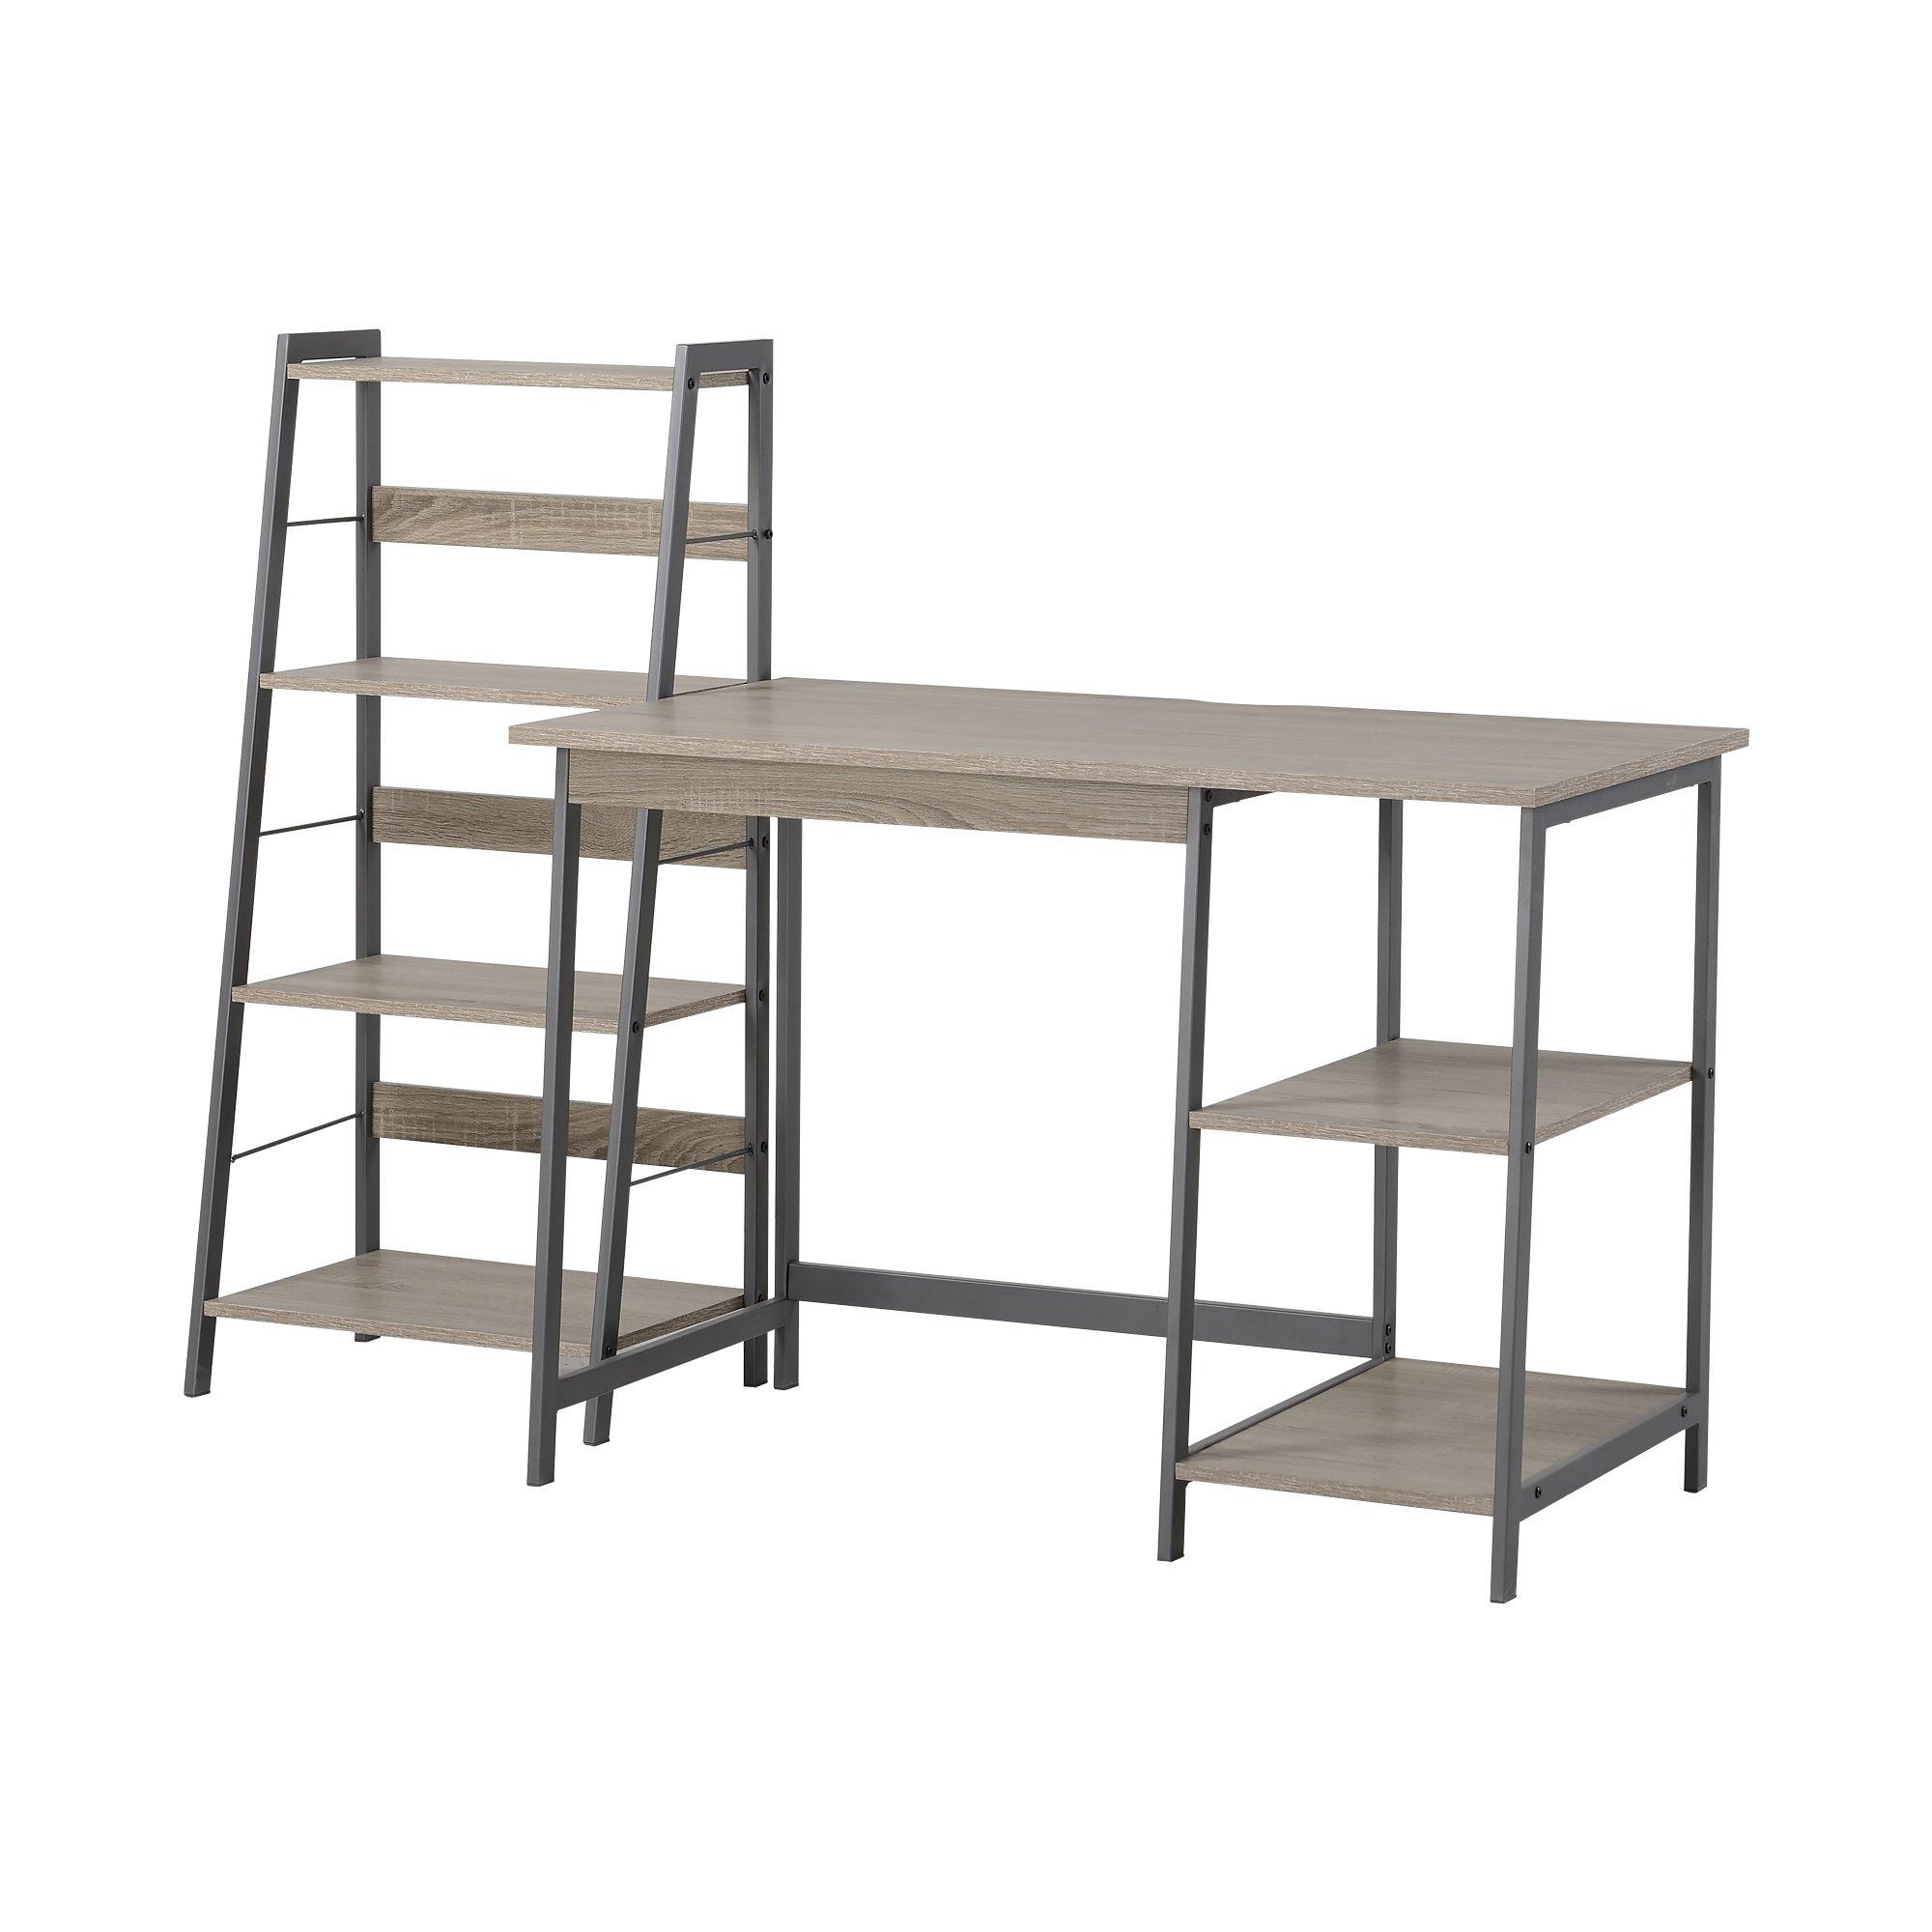 HOMESTAR 2 Piece Laptop Desk & 4-Shelf Bookcase Set, 43'' x 23.6'' x 47''/20'' x 14'' x 44'', Reclaimed Wood by HOMESTAR